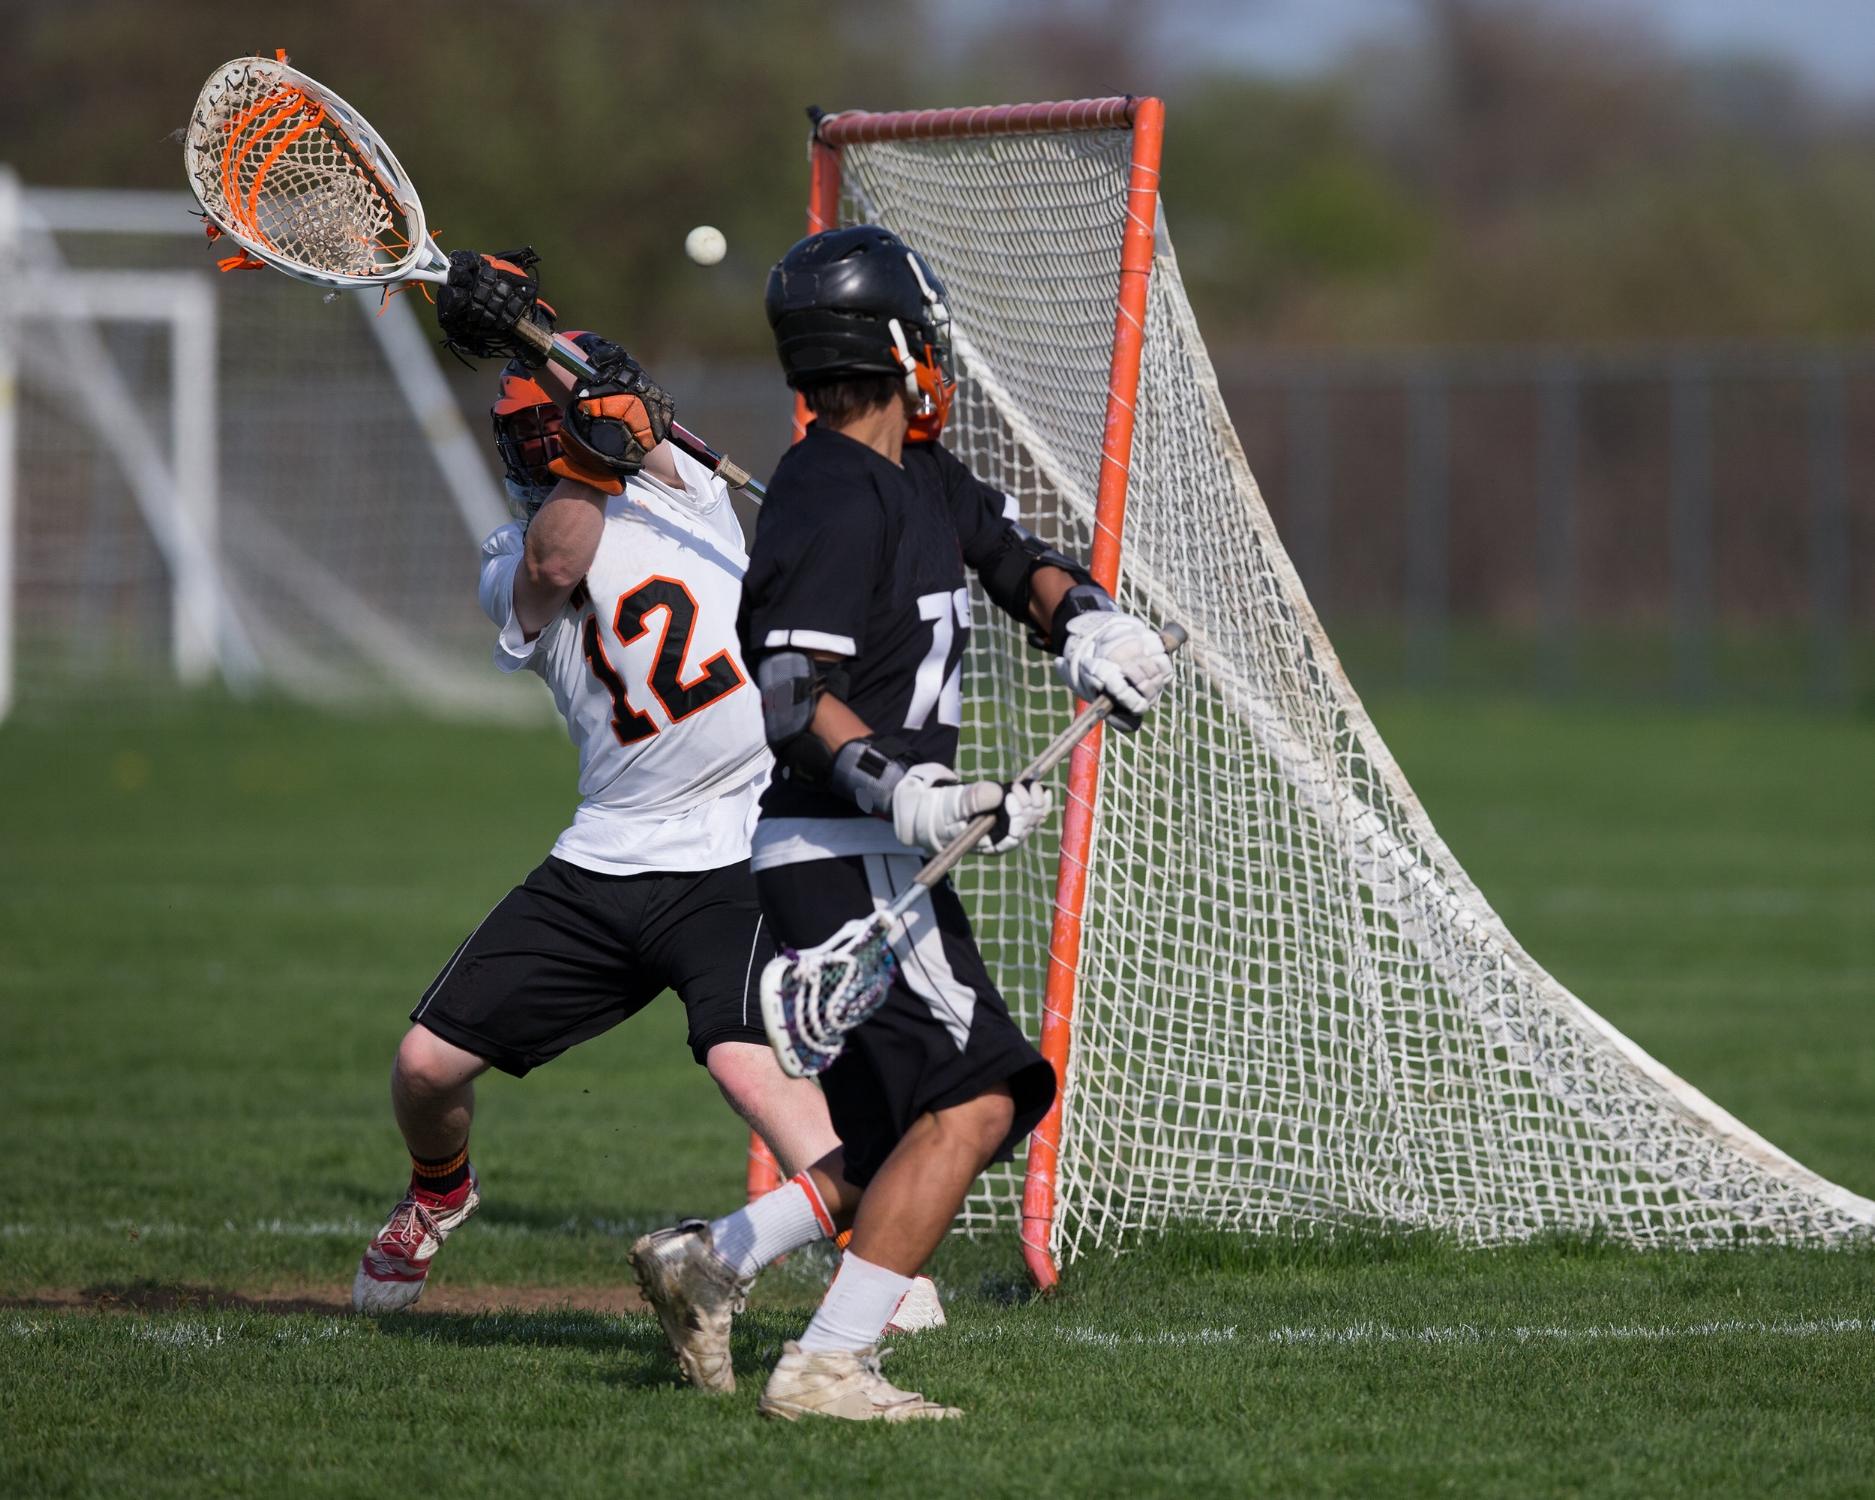 lacrosse player in action.jpg